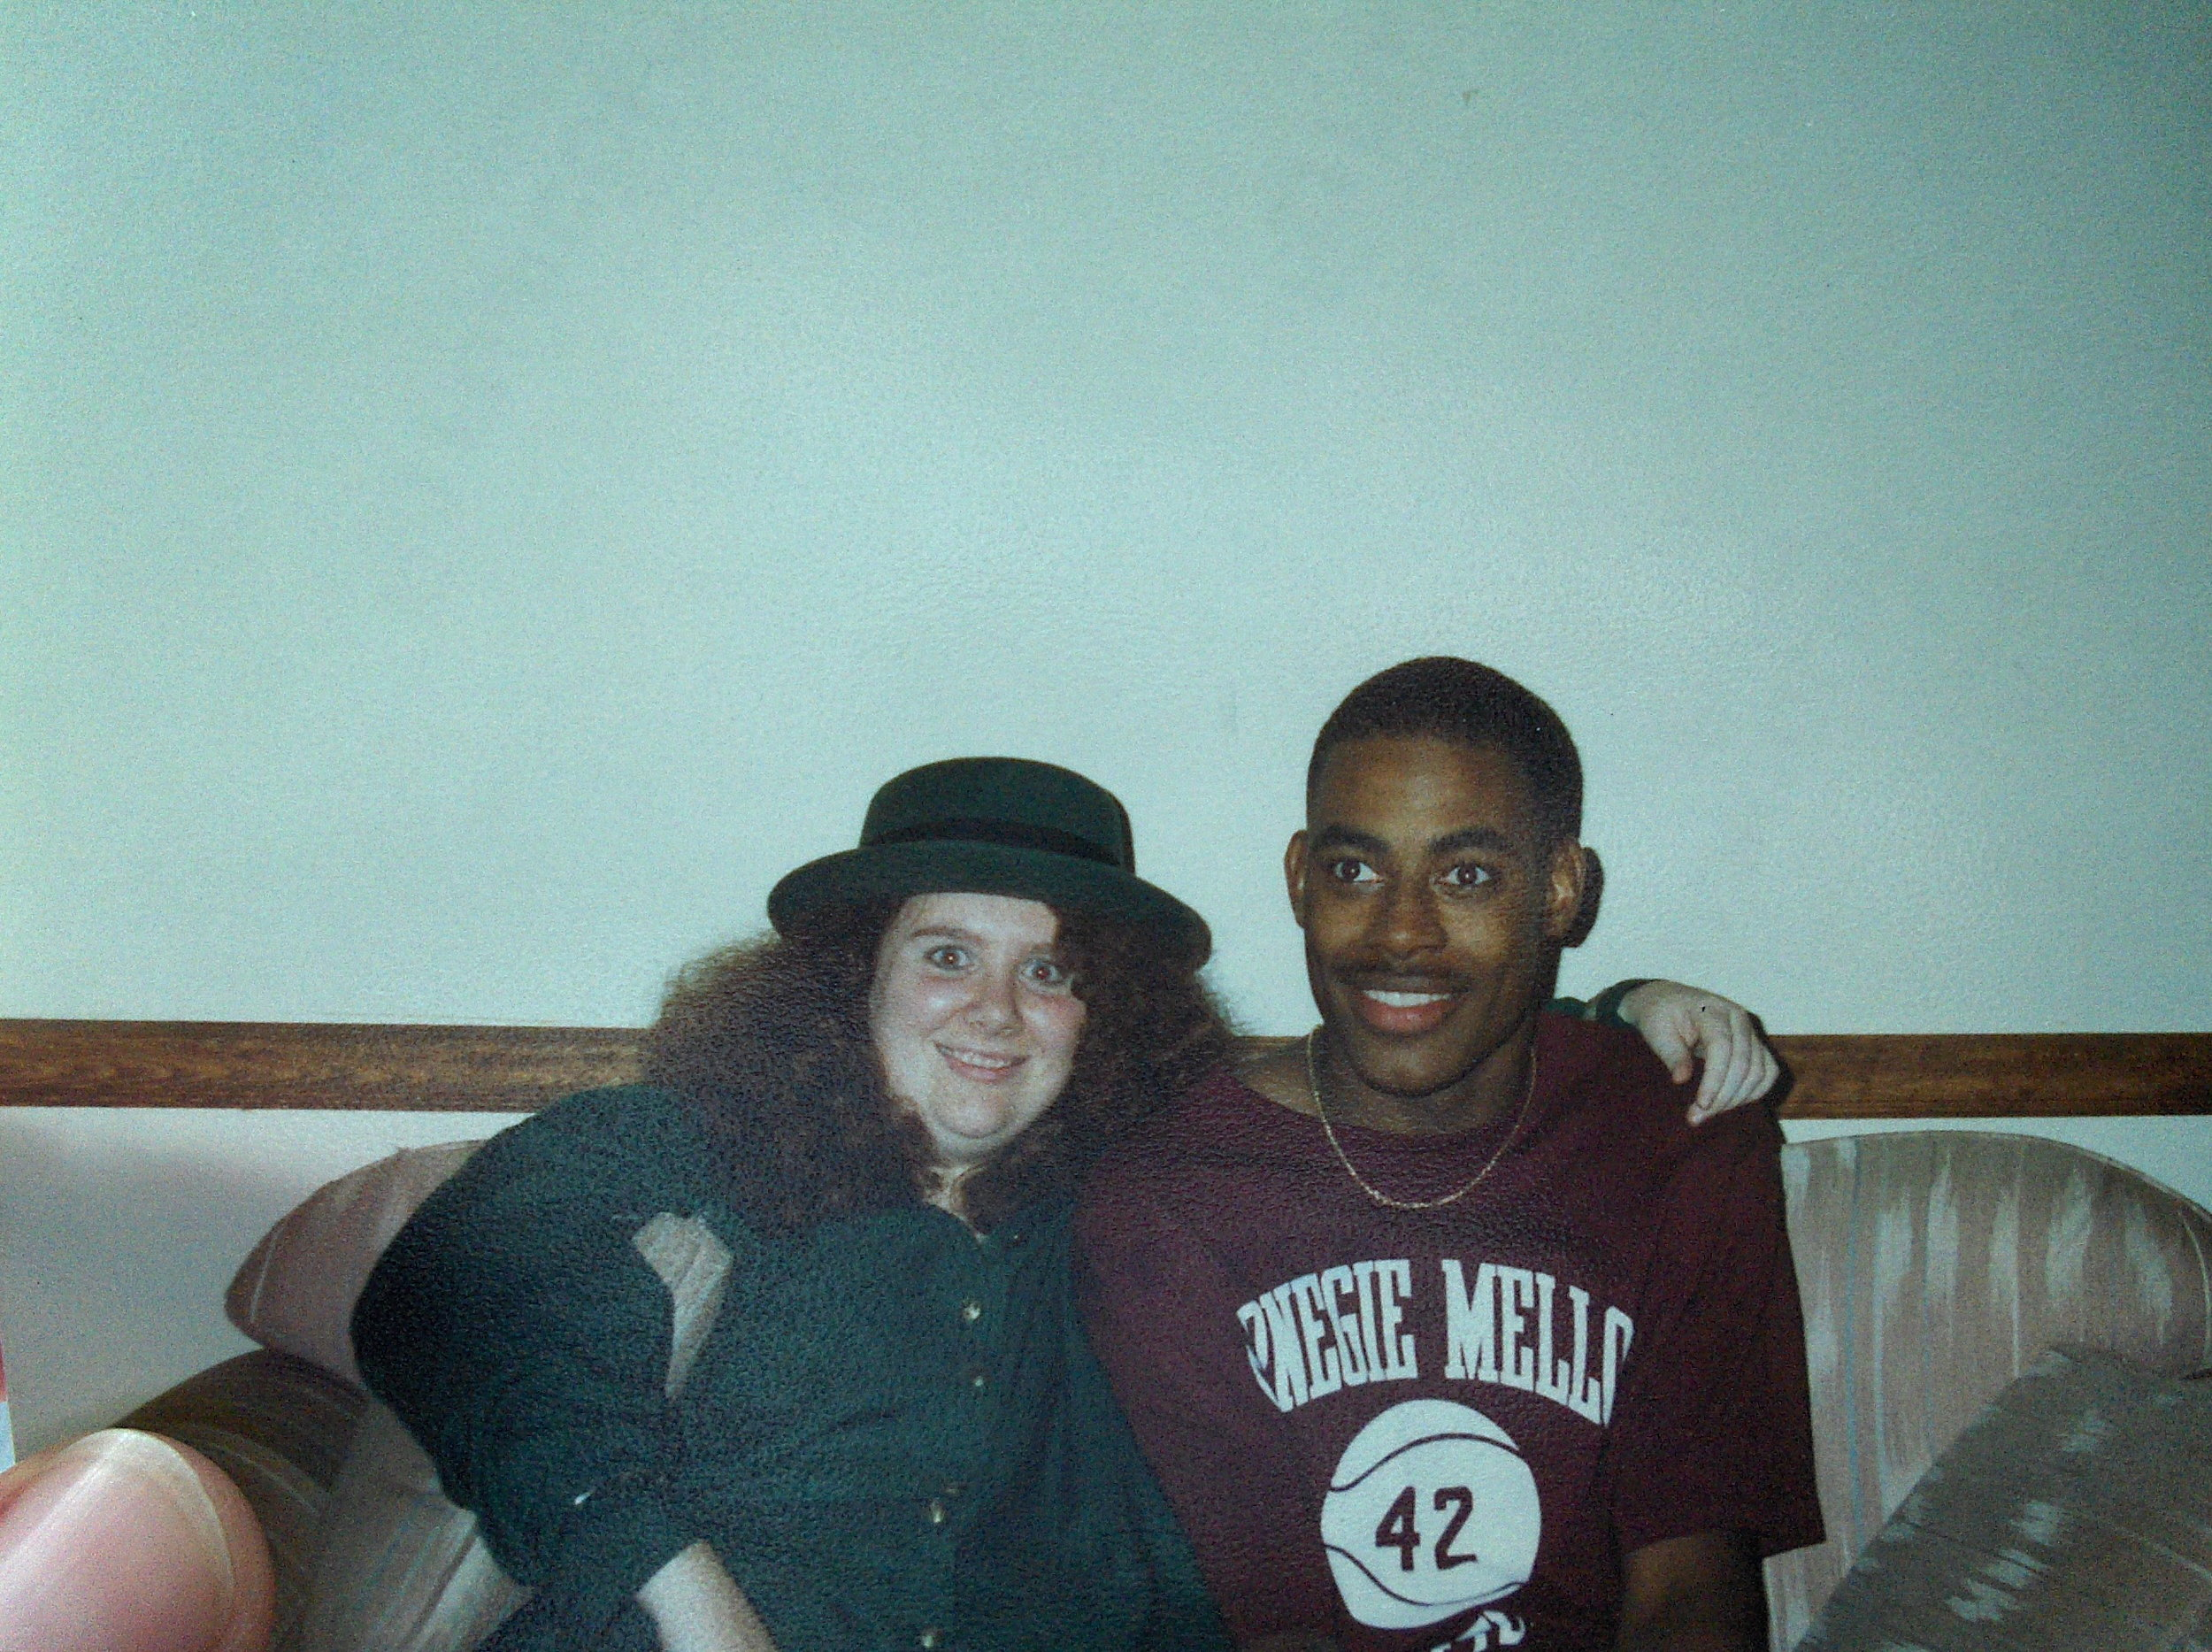 Deb and Lamman ~25 years ago while undergraduates at CMU